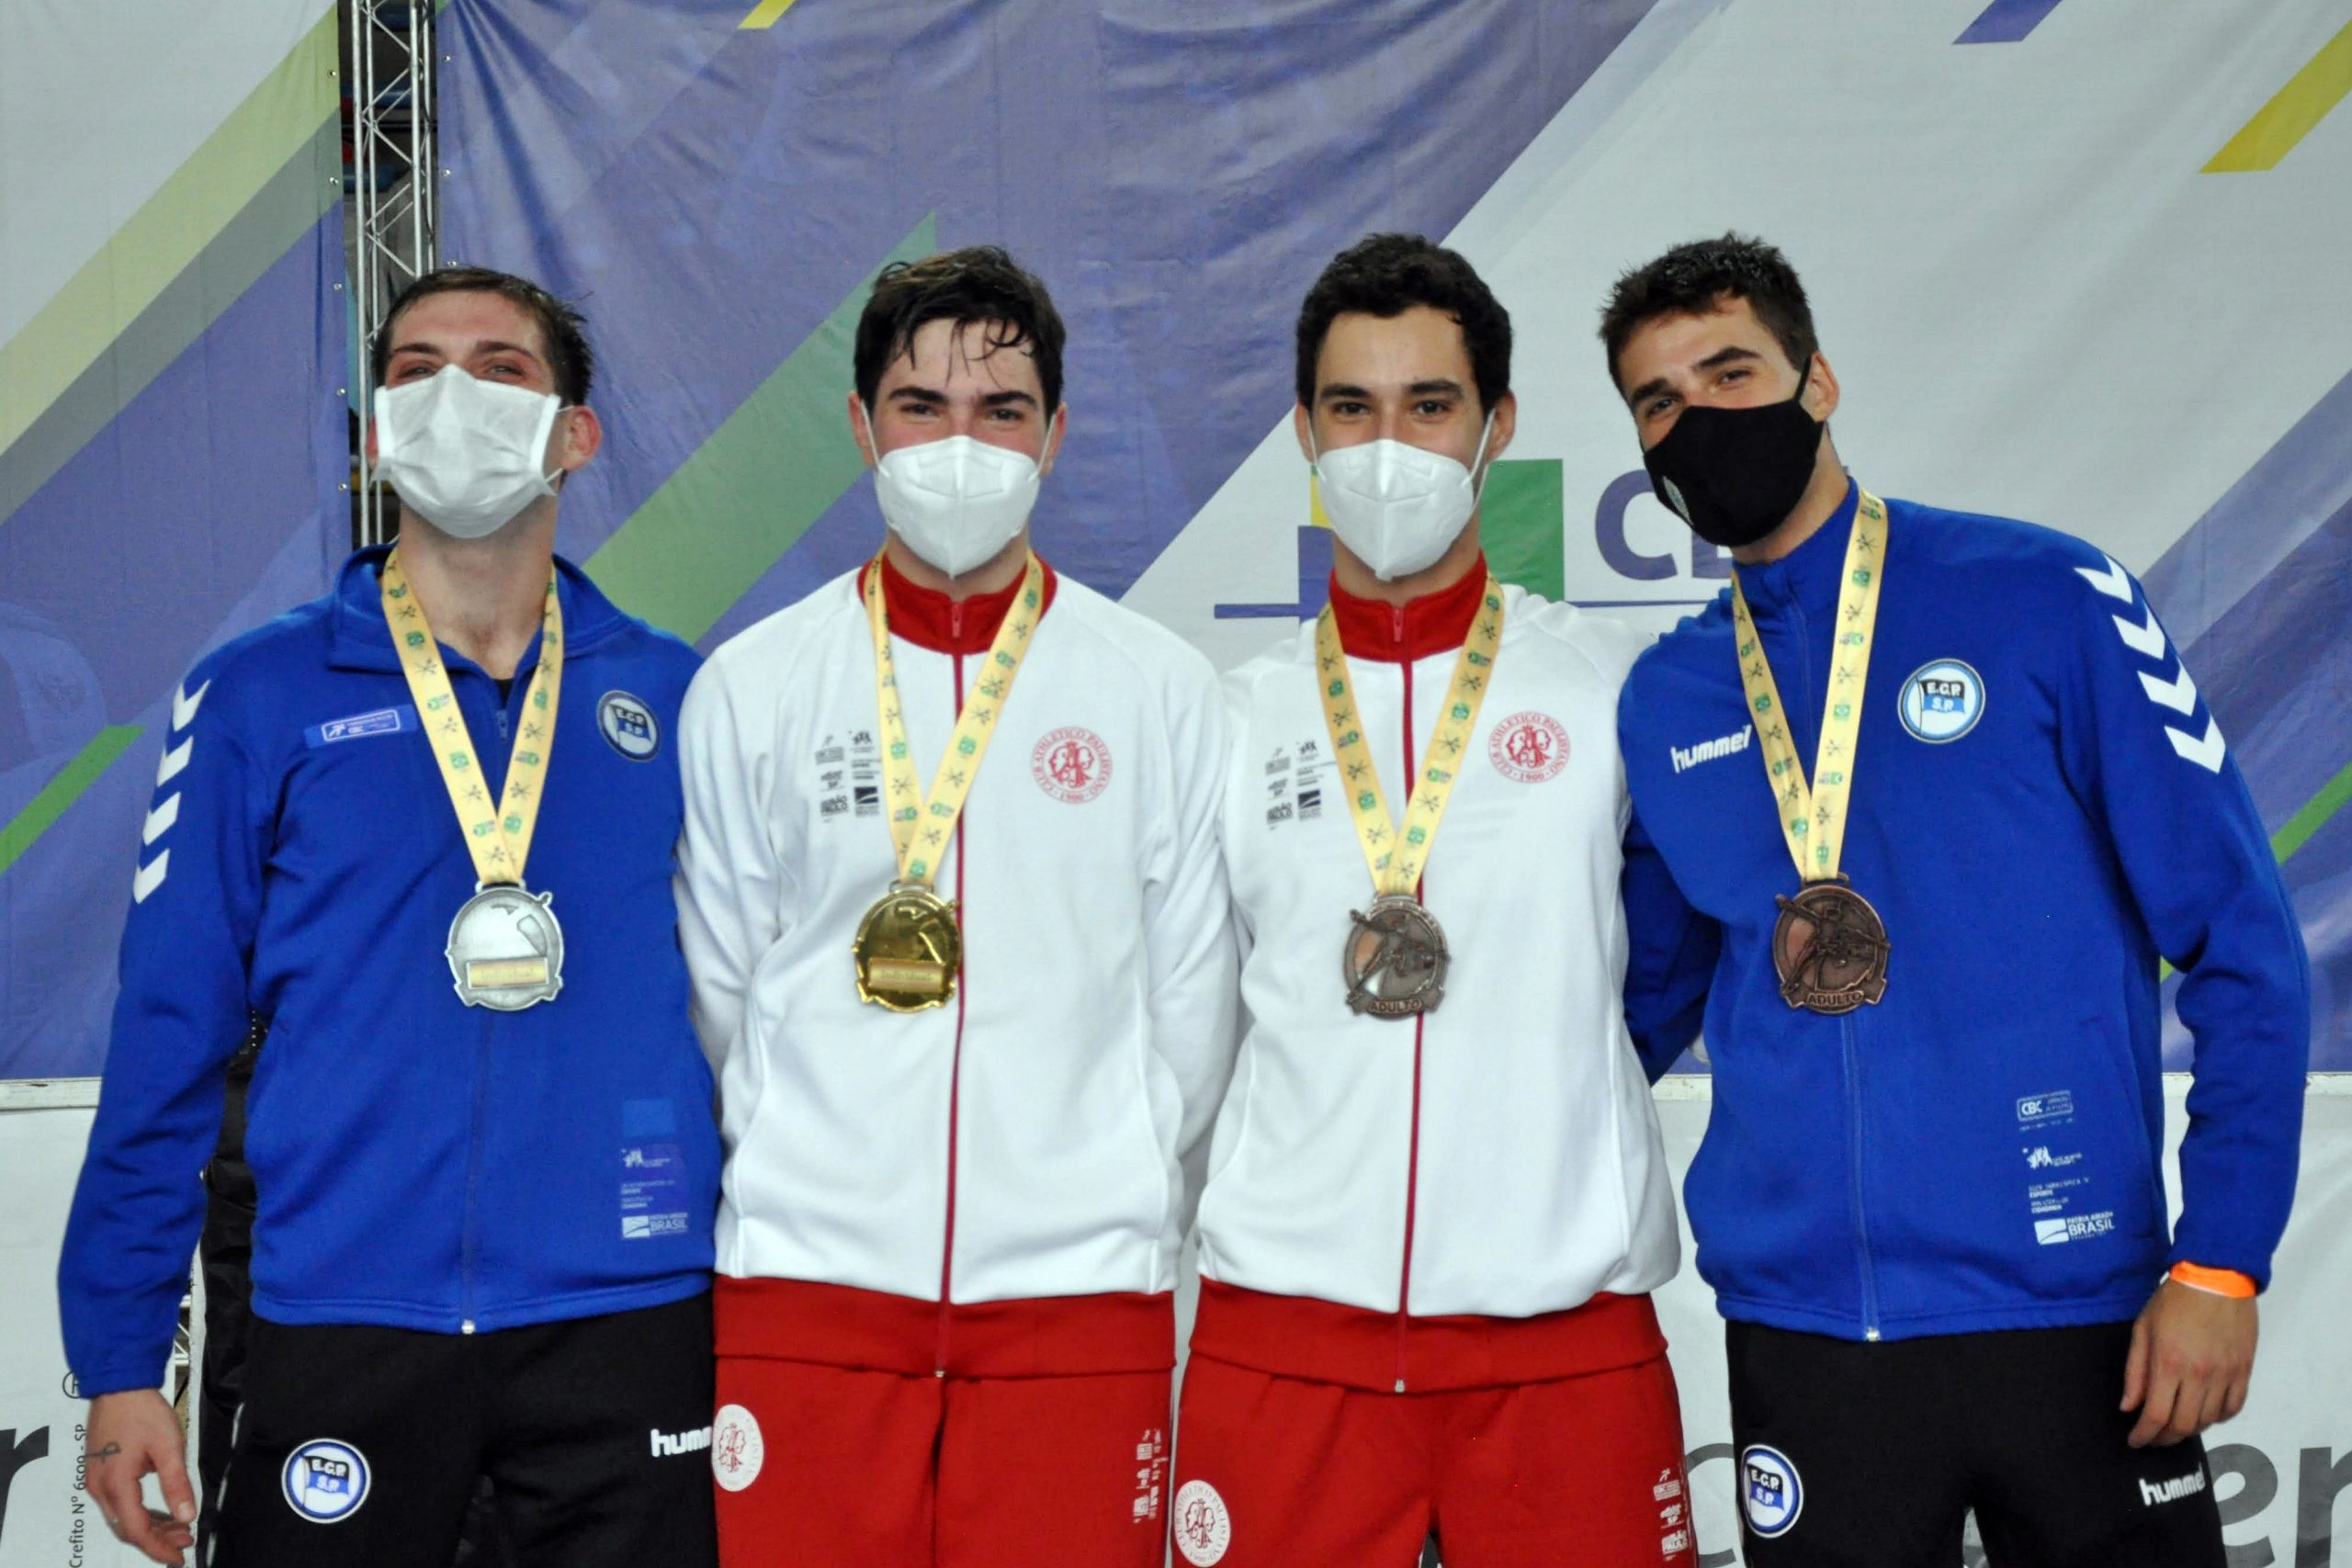 Atual campeão brasileiro sub-20 de sabre masculino, Murilo Garrigós conquista o Campeonato Brasileiro Adulto